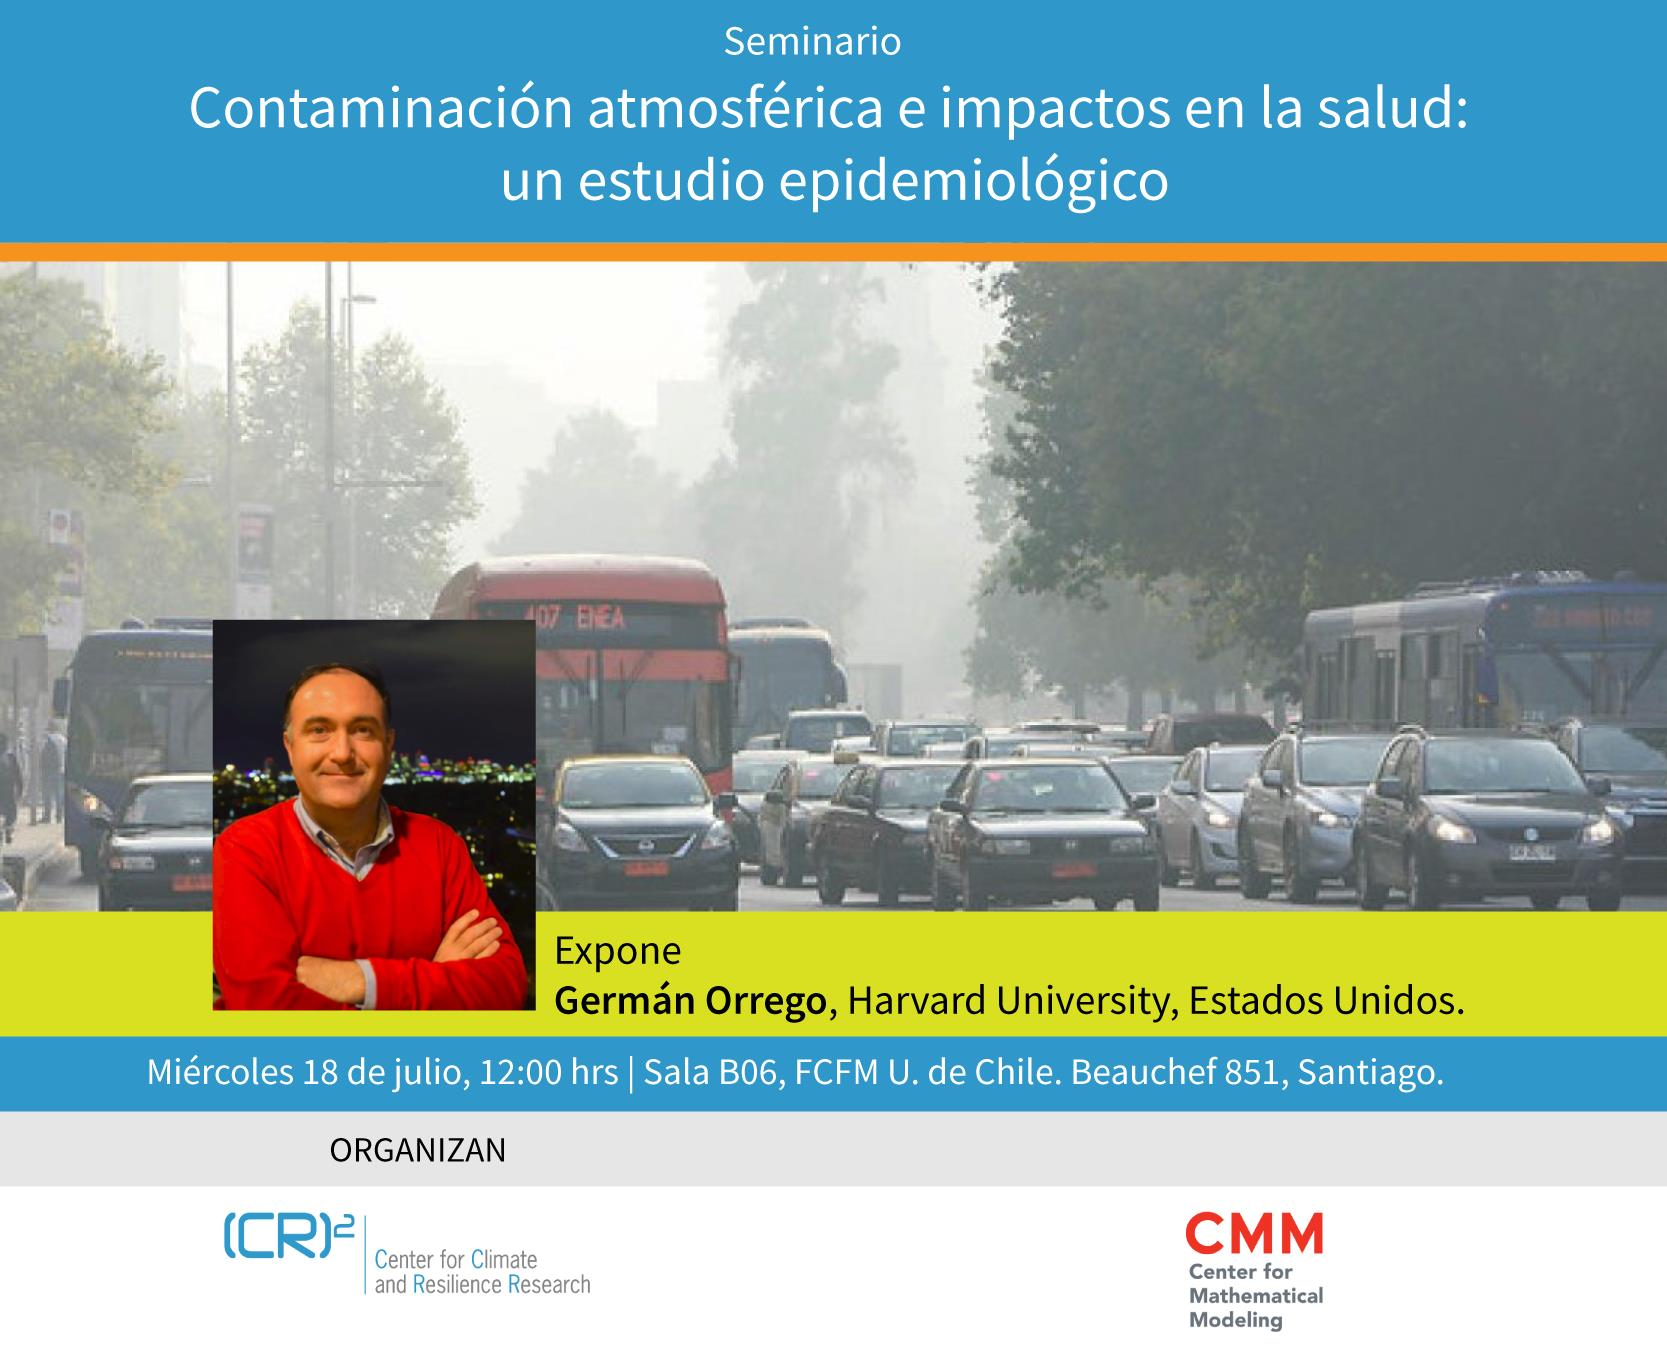 Seminario: Contaminación atmosférica e impactos en salud